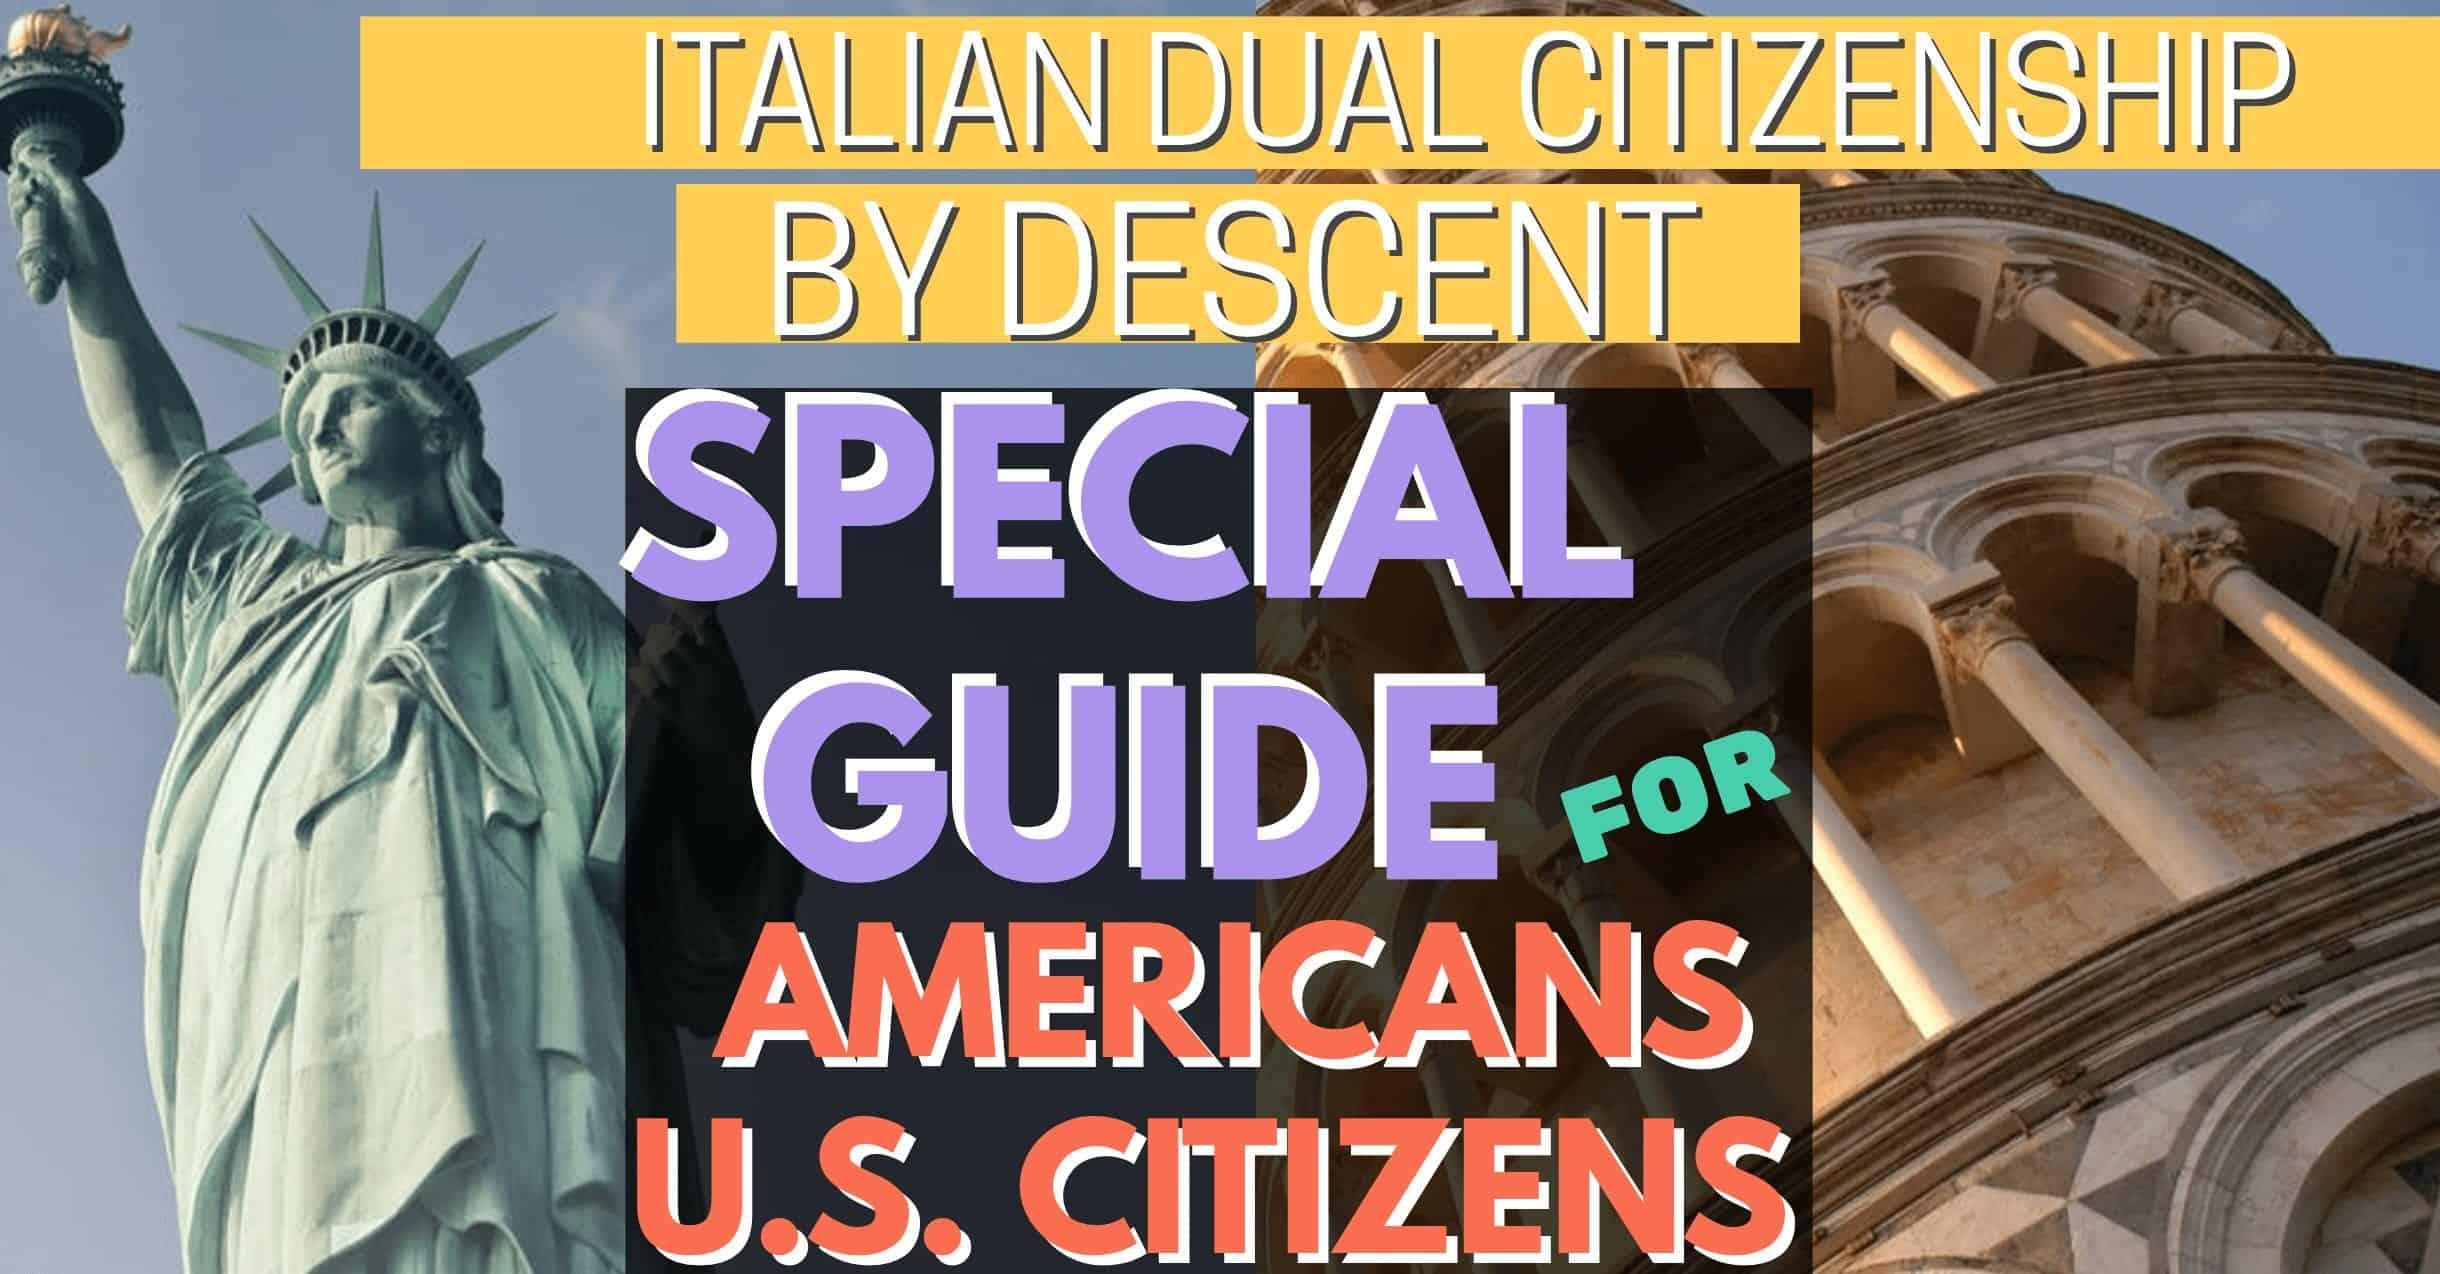 italian-citizenship-assistance-usa-ITALIAN CITIZENSHIP BY DESCENT USA AMERICAN DESCENDENDANTS italian-citizeship-jure-sanguinis-boost-italian-citizenship-by-descent-italian-citizenship-processing-time-speed-up-italian-citizenship-by-descent-processing-time-italian-citizenship-assistance-italian-dual-citizenship-lawyer-italian-citizenship-service-italian-citizenship-jure-sanguinis-assistance-boost-italian-citizenship-processing-time